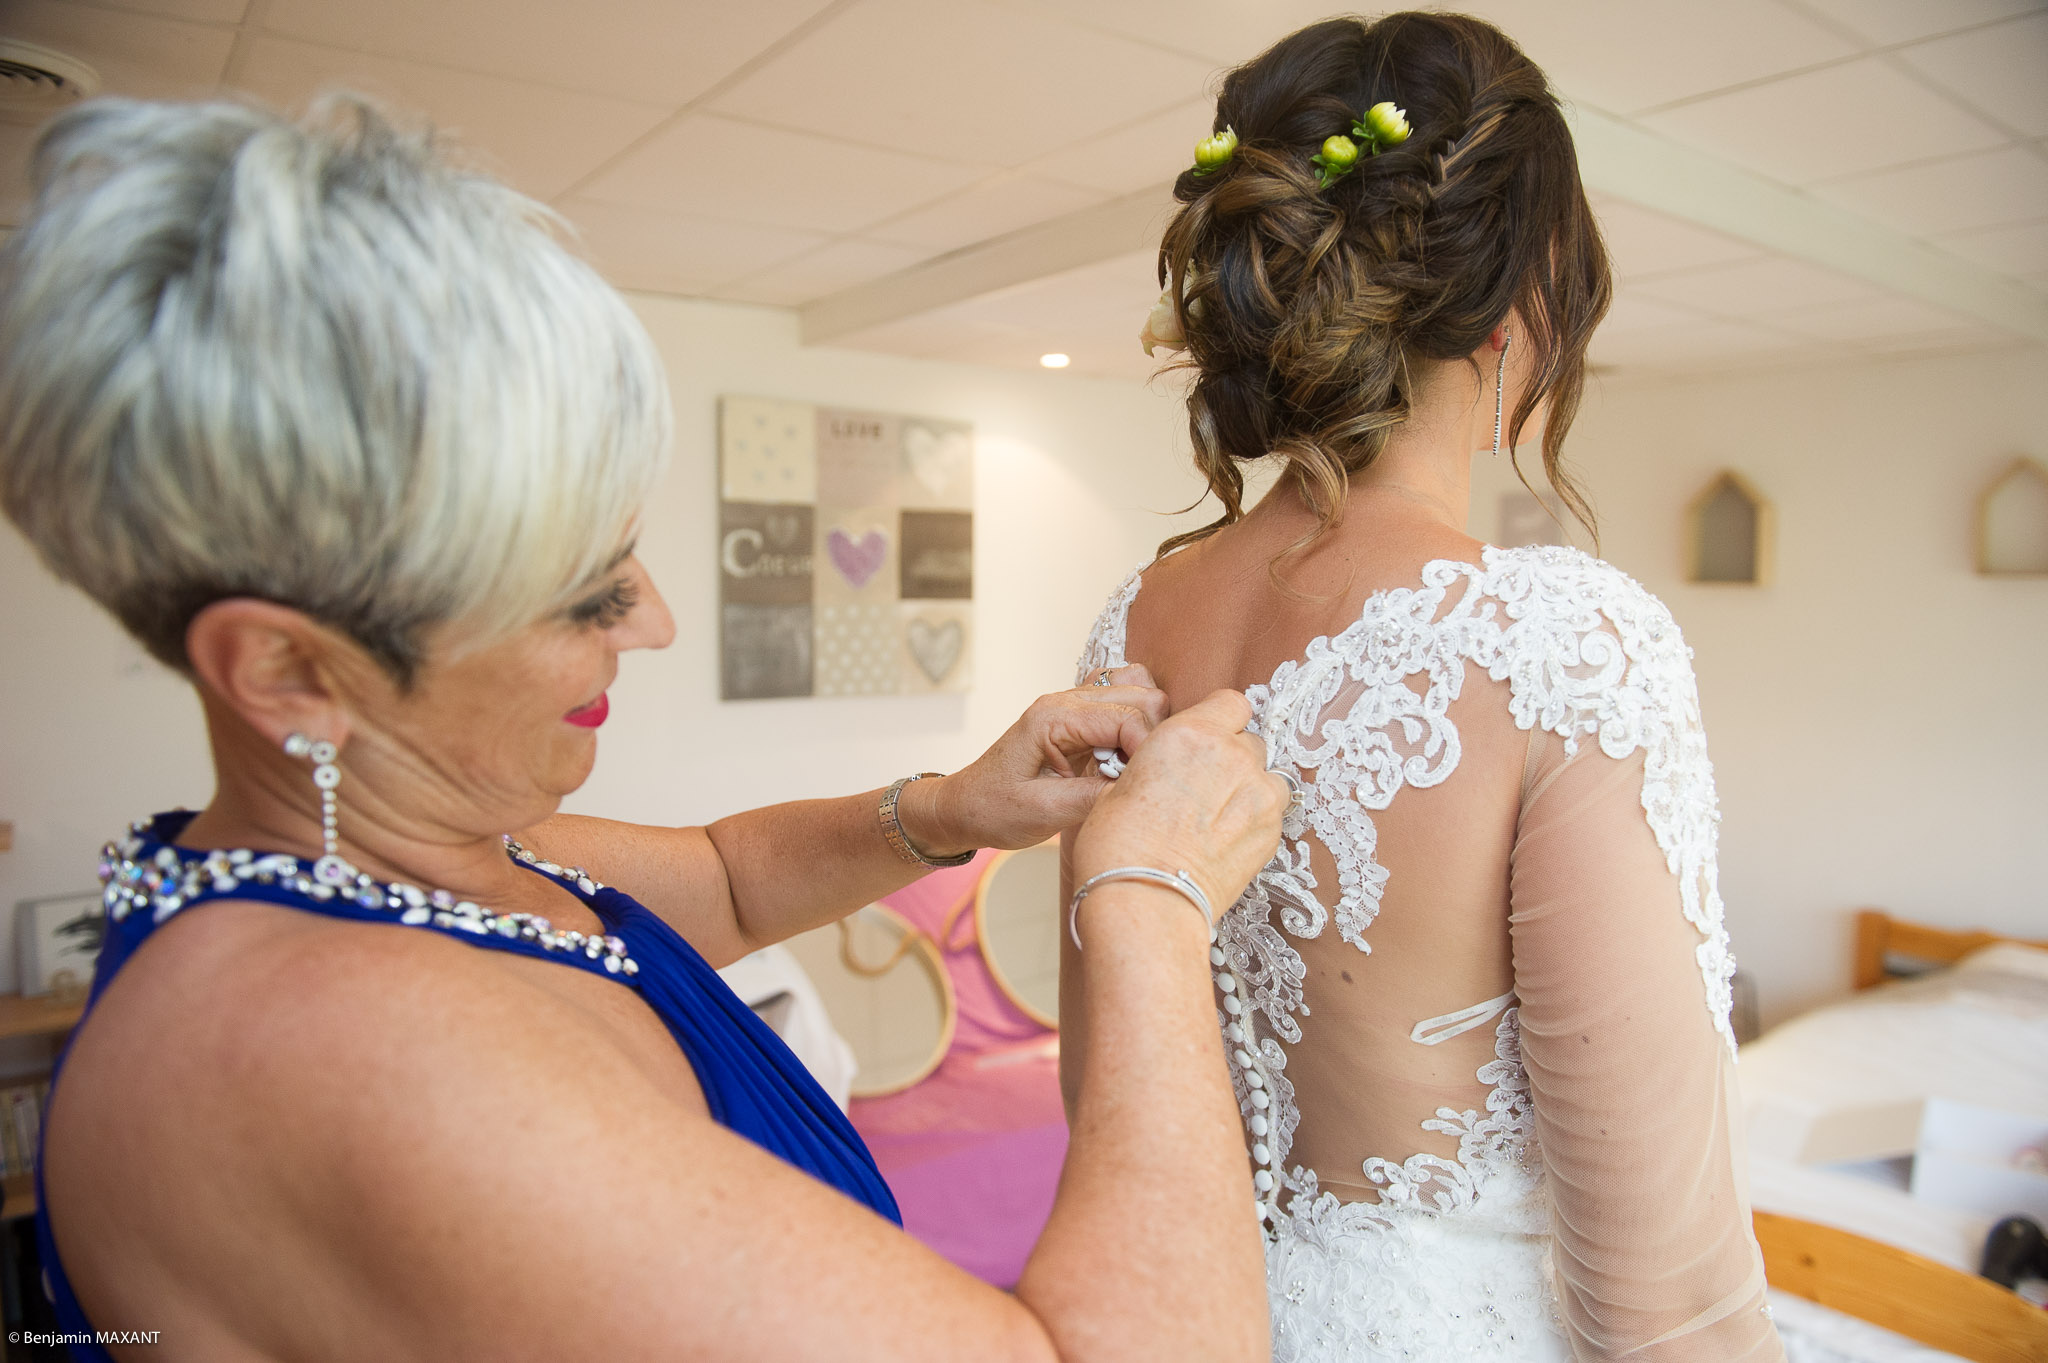 Passage de la robe de mariée : Julie aidée de sa maman